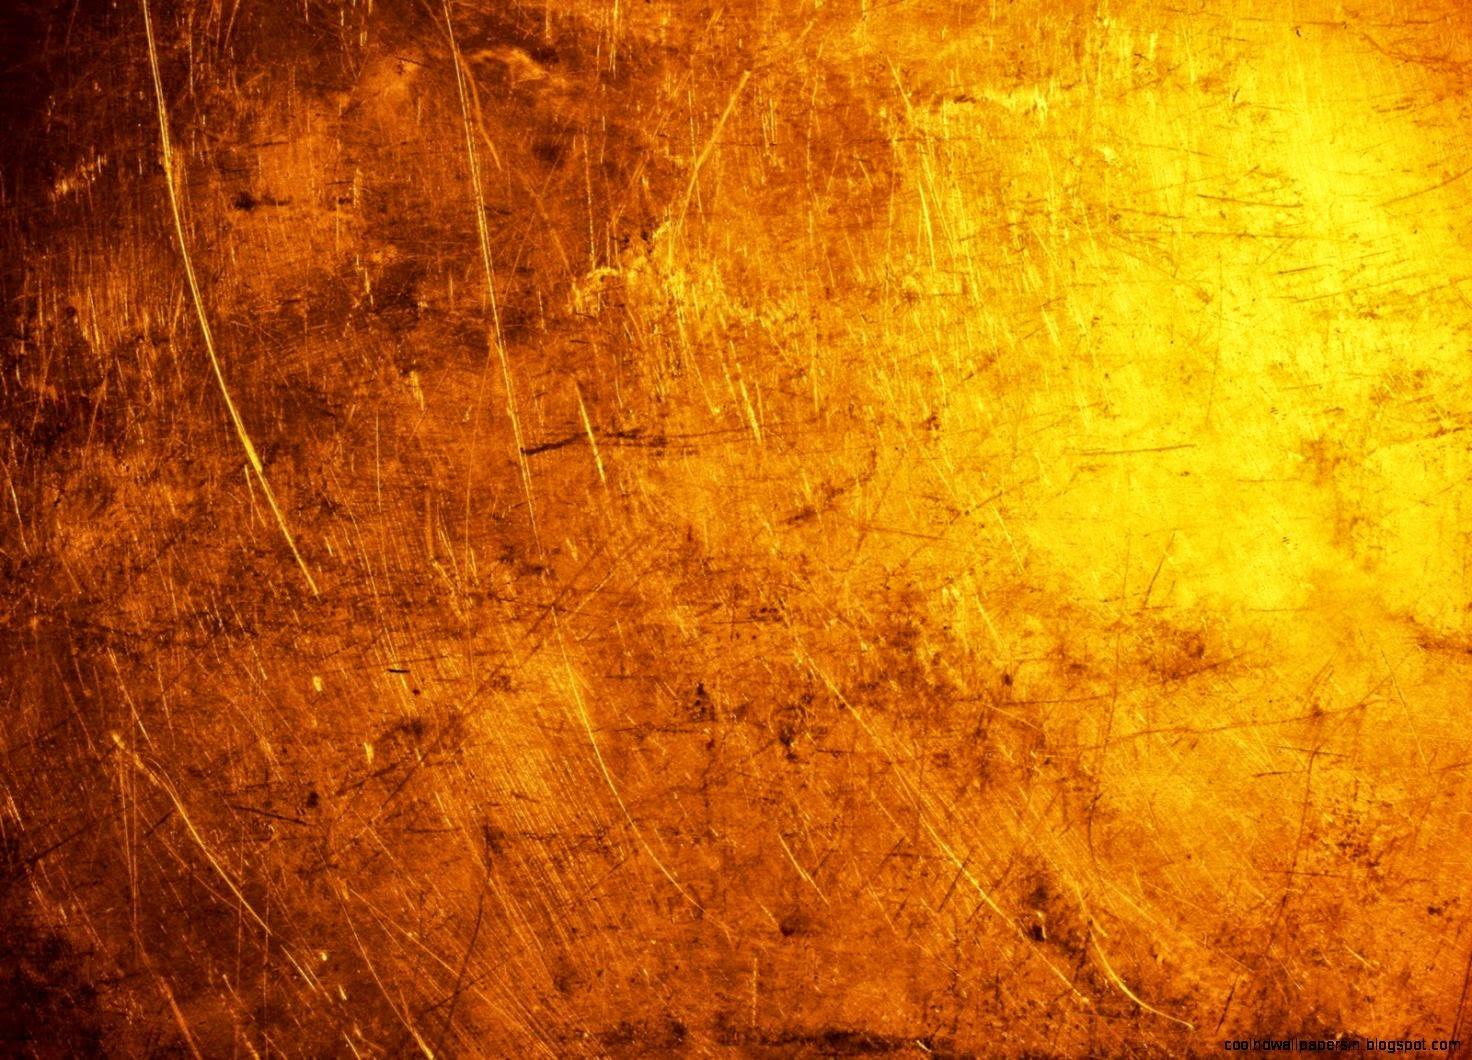 Gold Textured Wallpaper Cool Hd Wallpapers